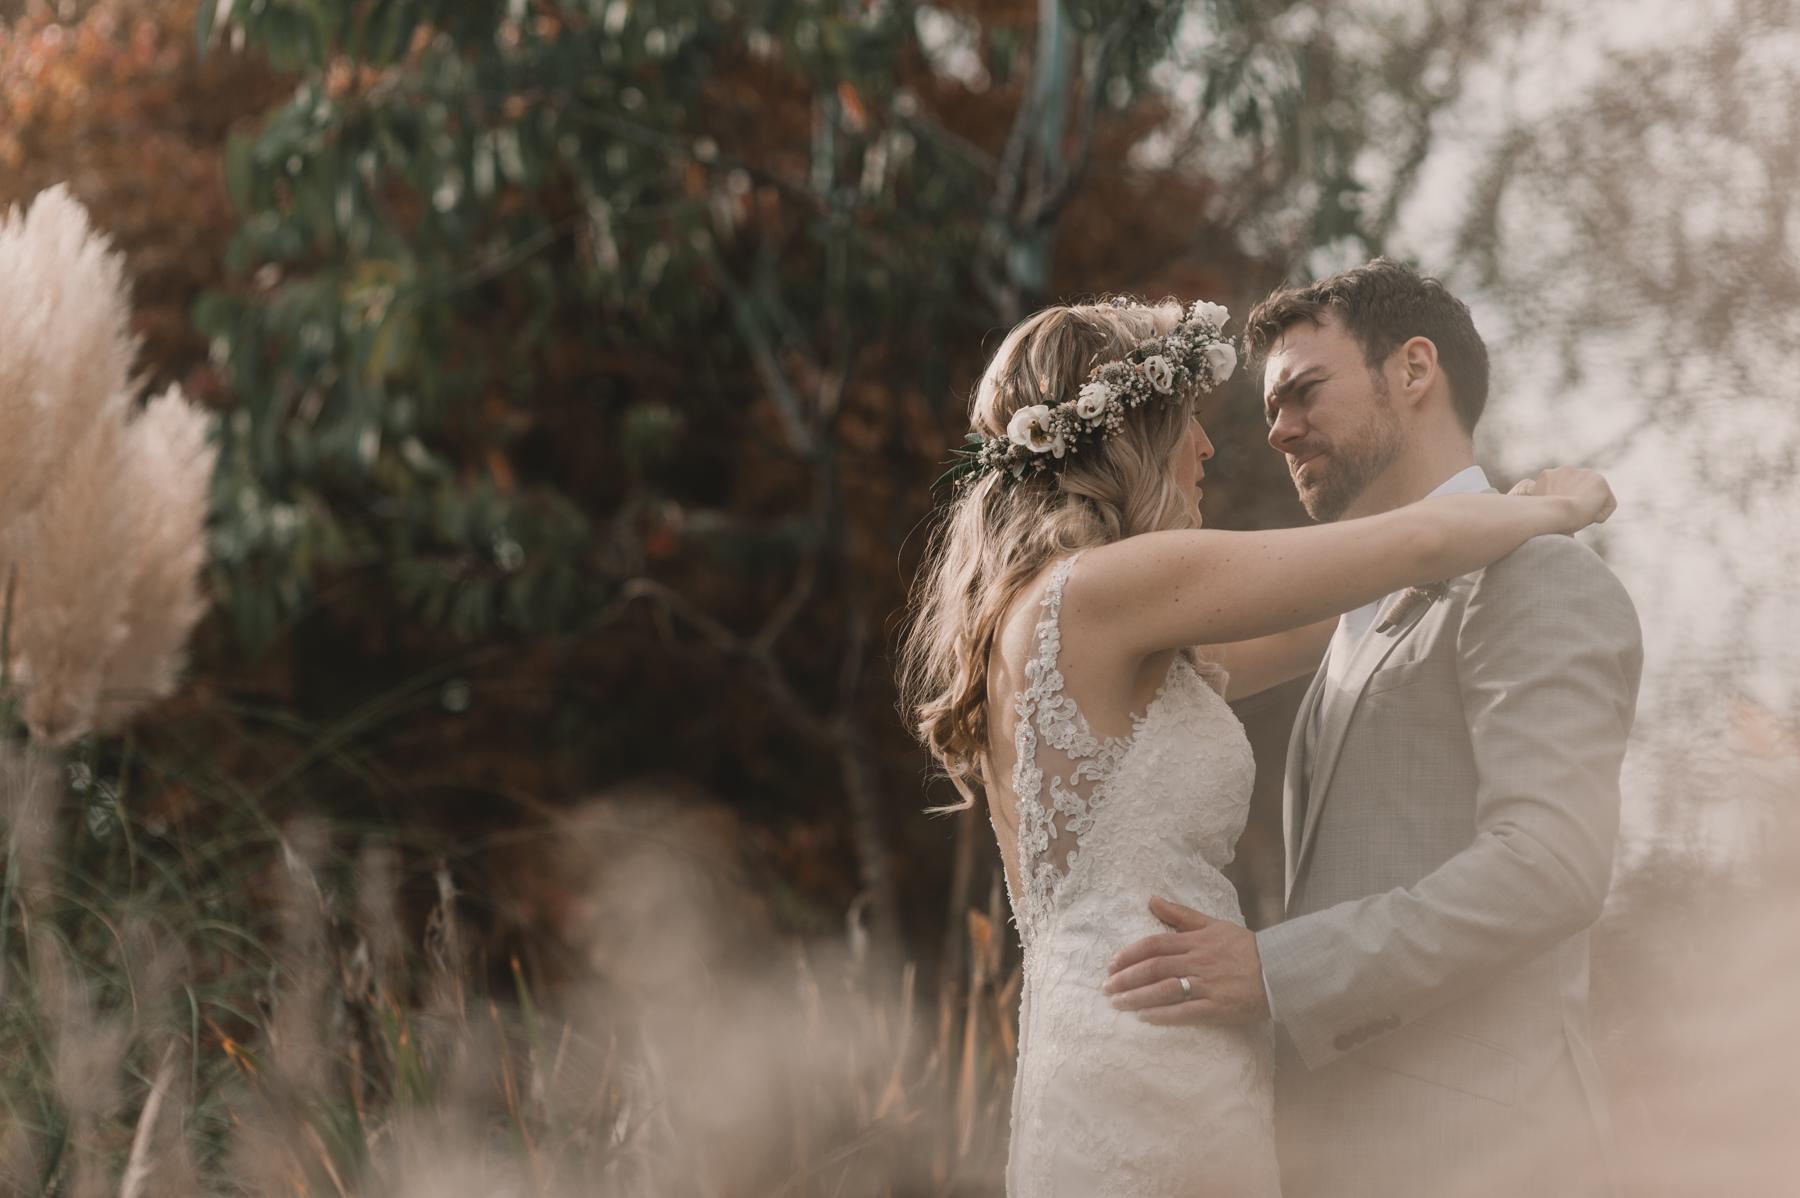 Herefordshire-barn-wedding-highlights-089.jpg